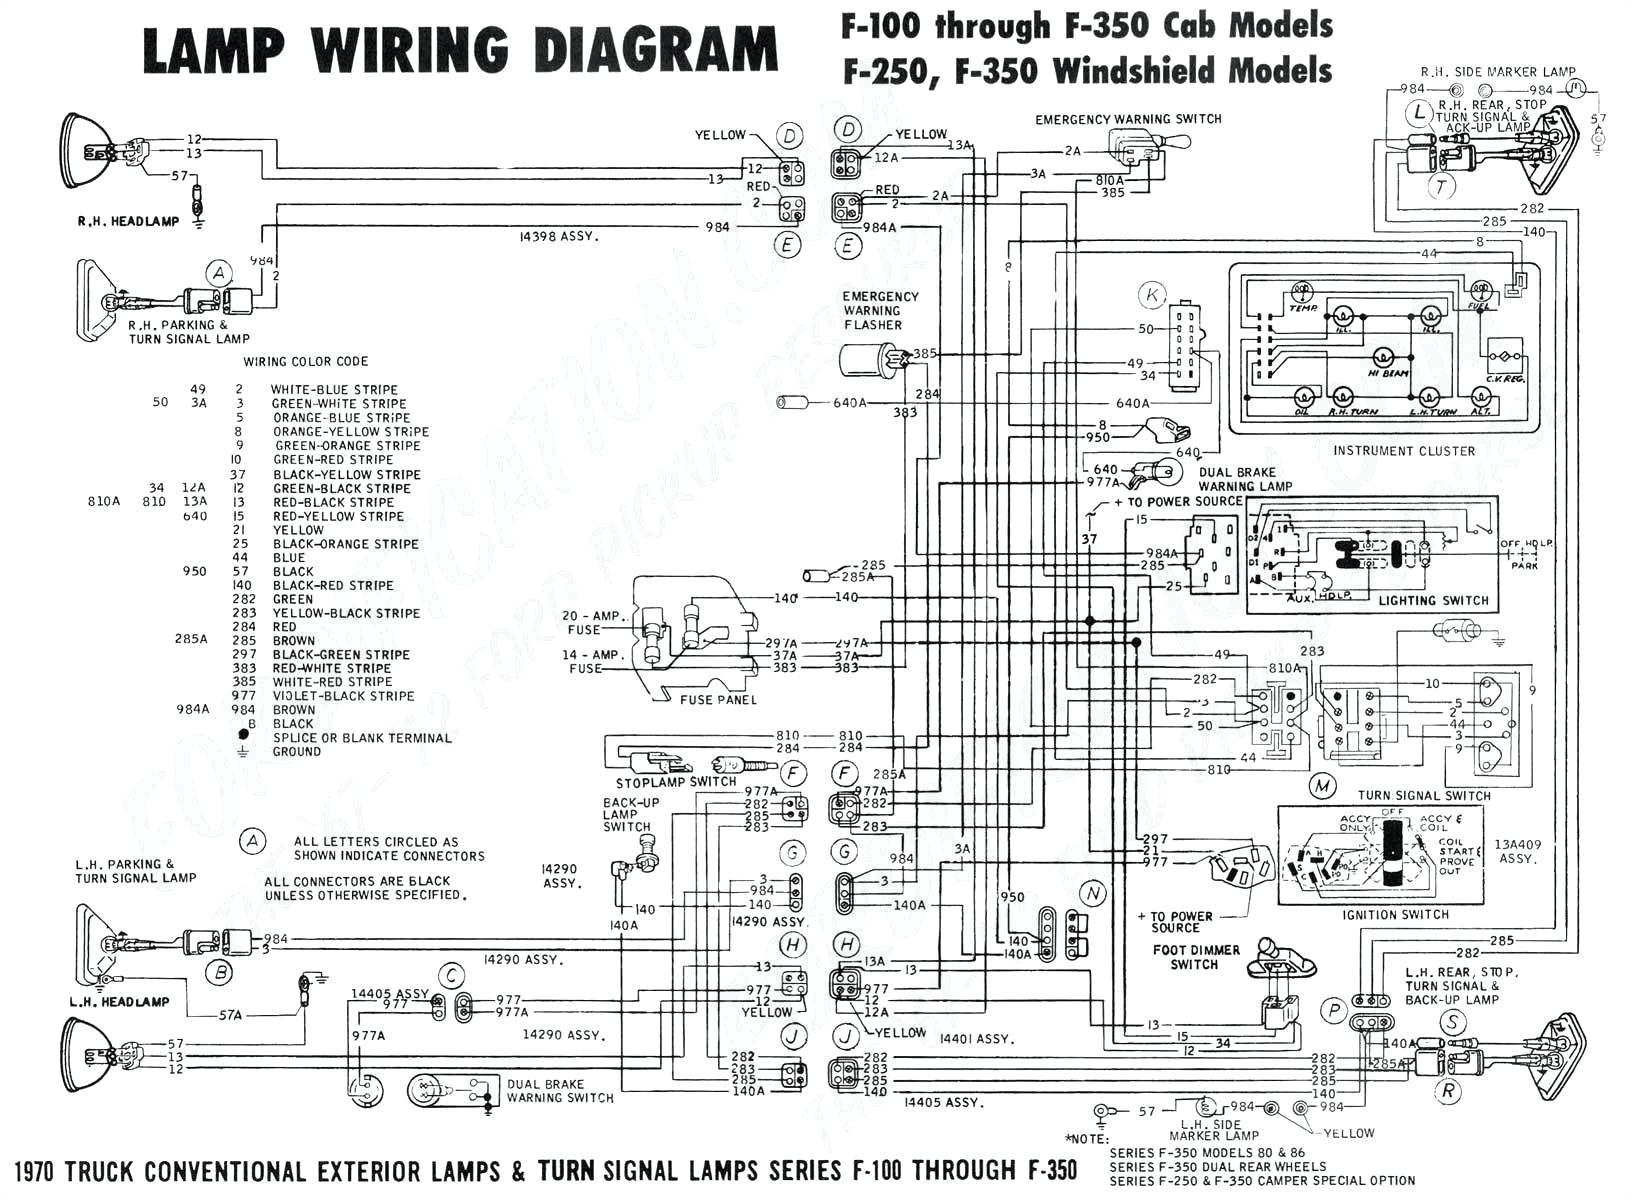 2005 chevy truck trailer wiring wiring diagram all 2005 chevy silverado wiring harness get wiring diagram